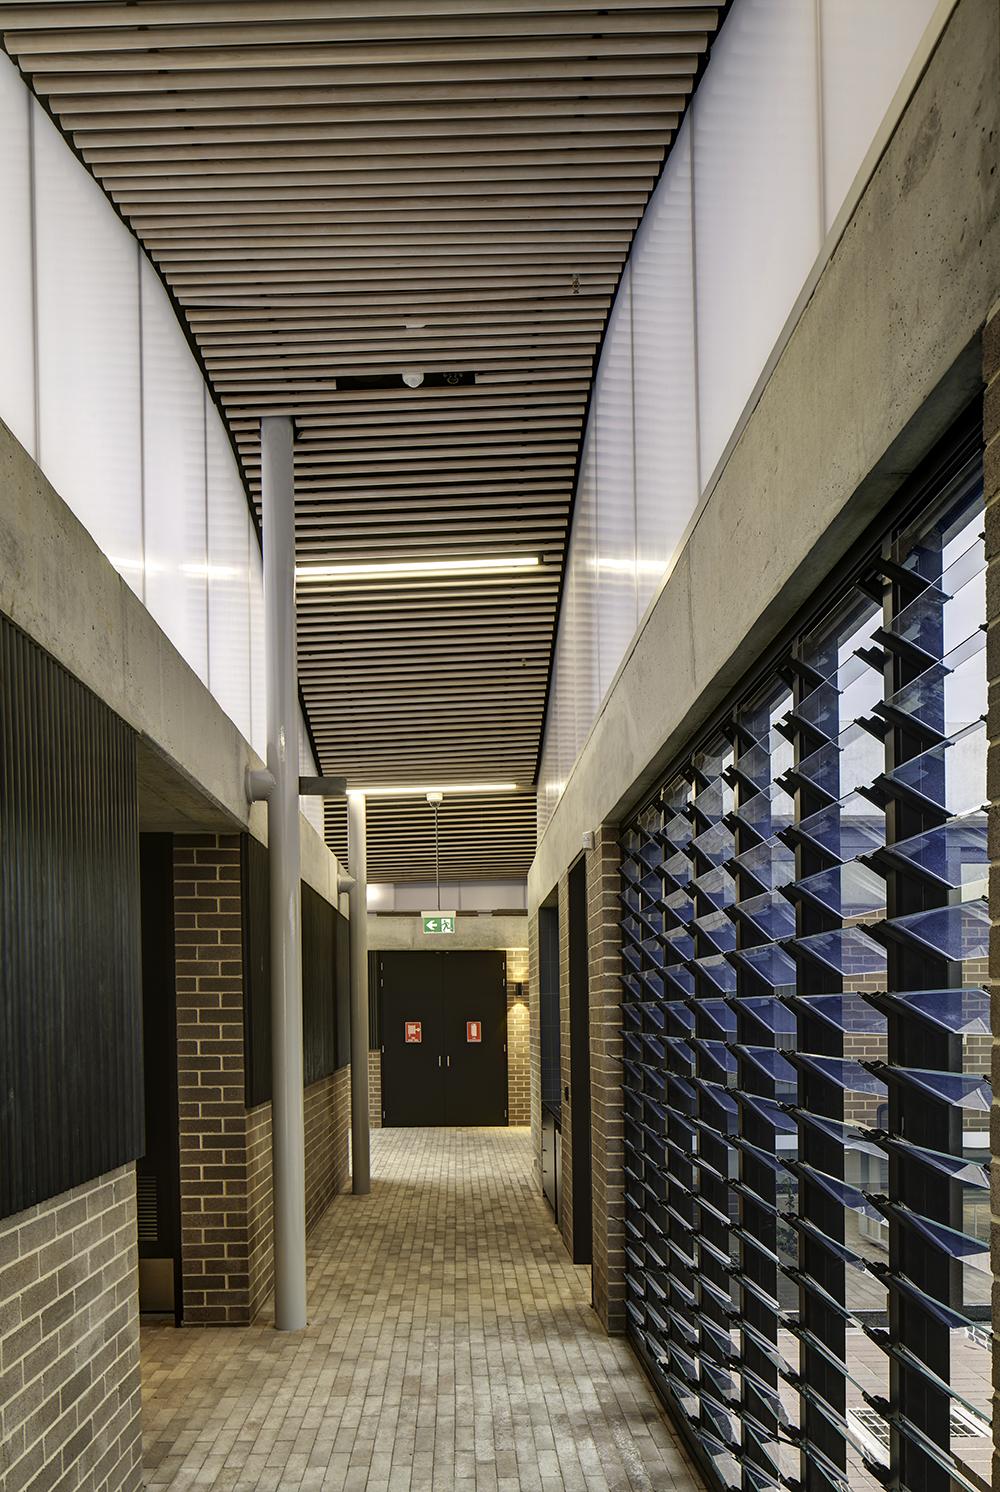 4867-interior_Woodcroft Neighbourhood Centre_Carter Williamson_Brett Boardman_7